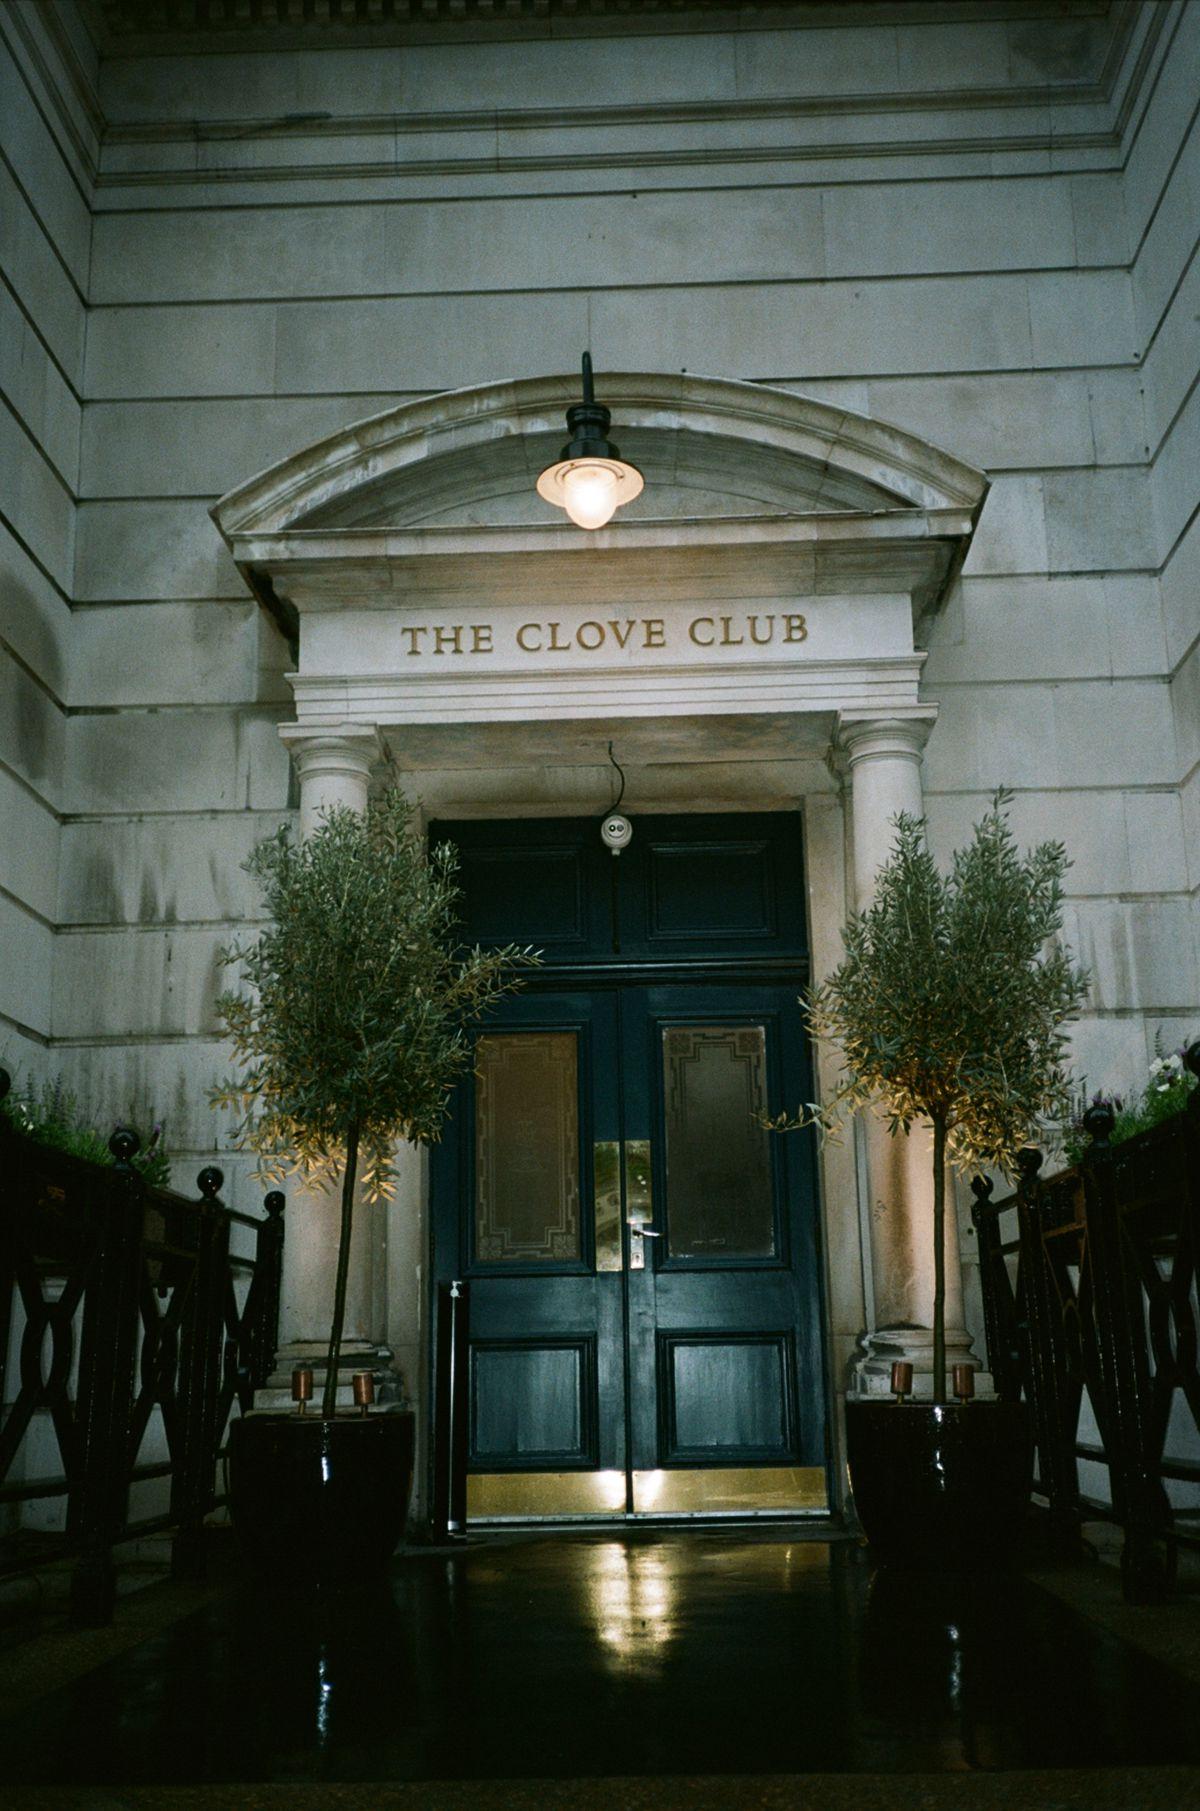 Michelin-starred restaurant in Shoreditch, The Clove Club